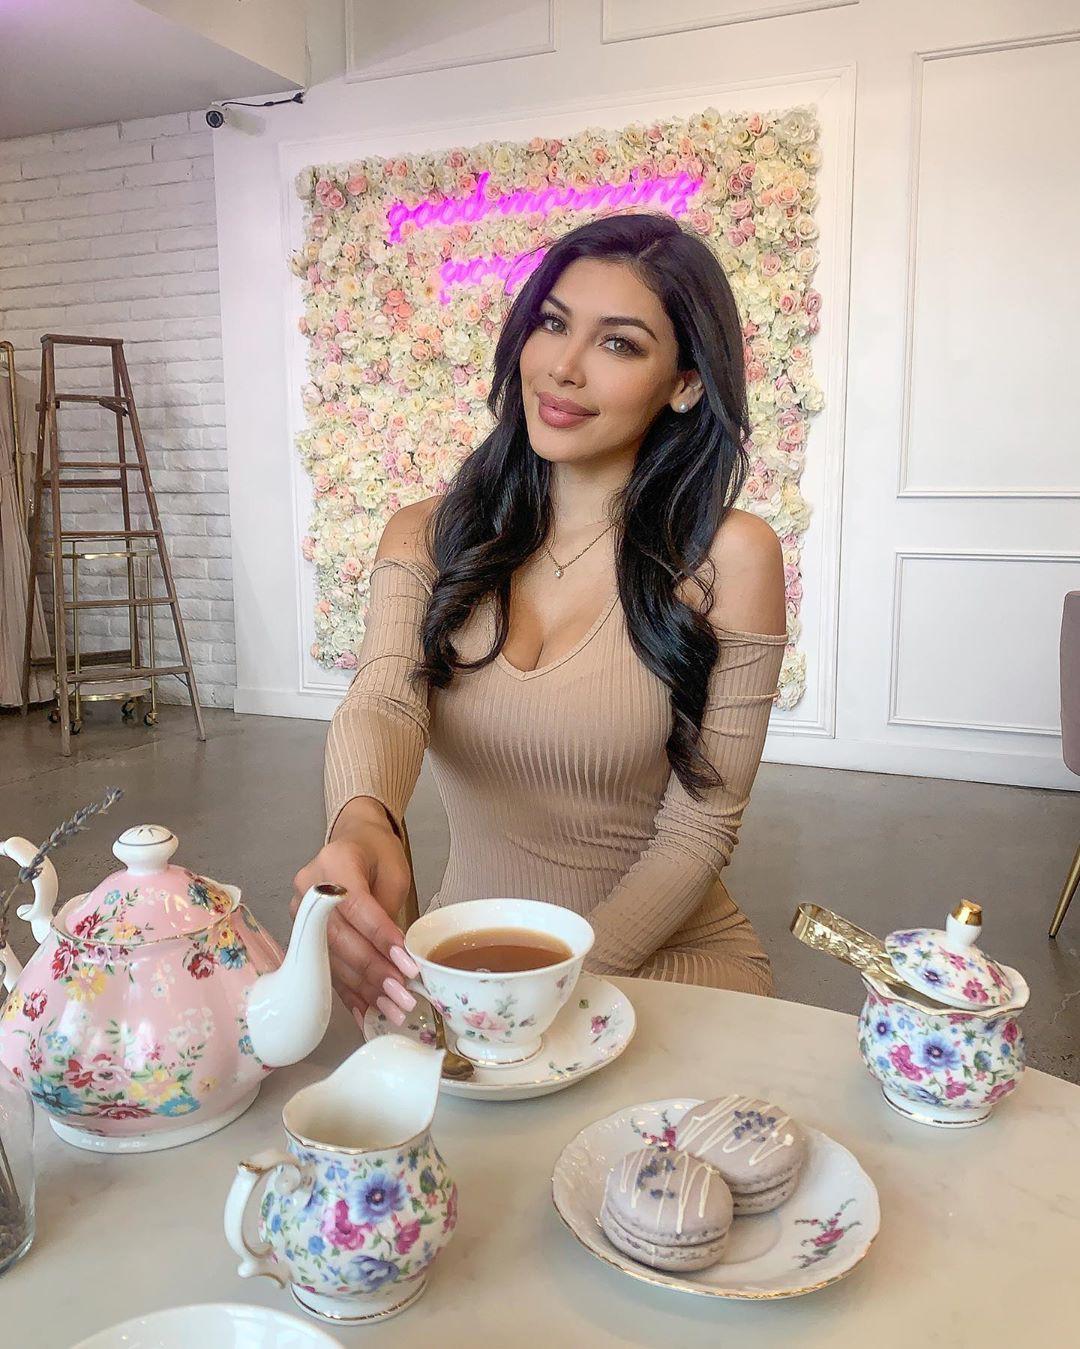 Tania Lucely, cake decorating, sweetness, serveware